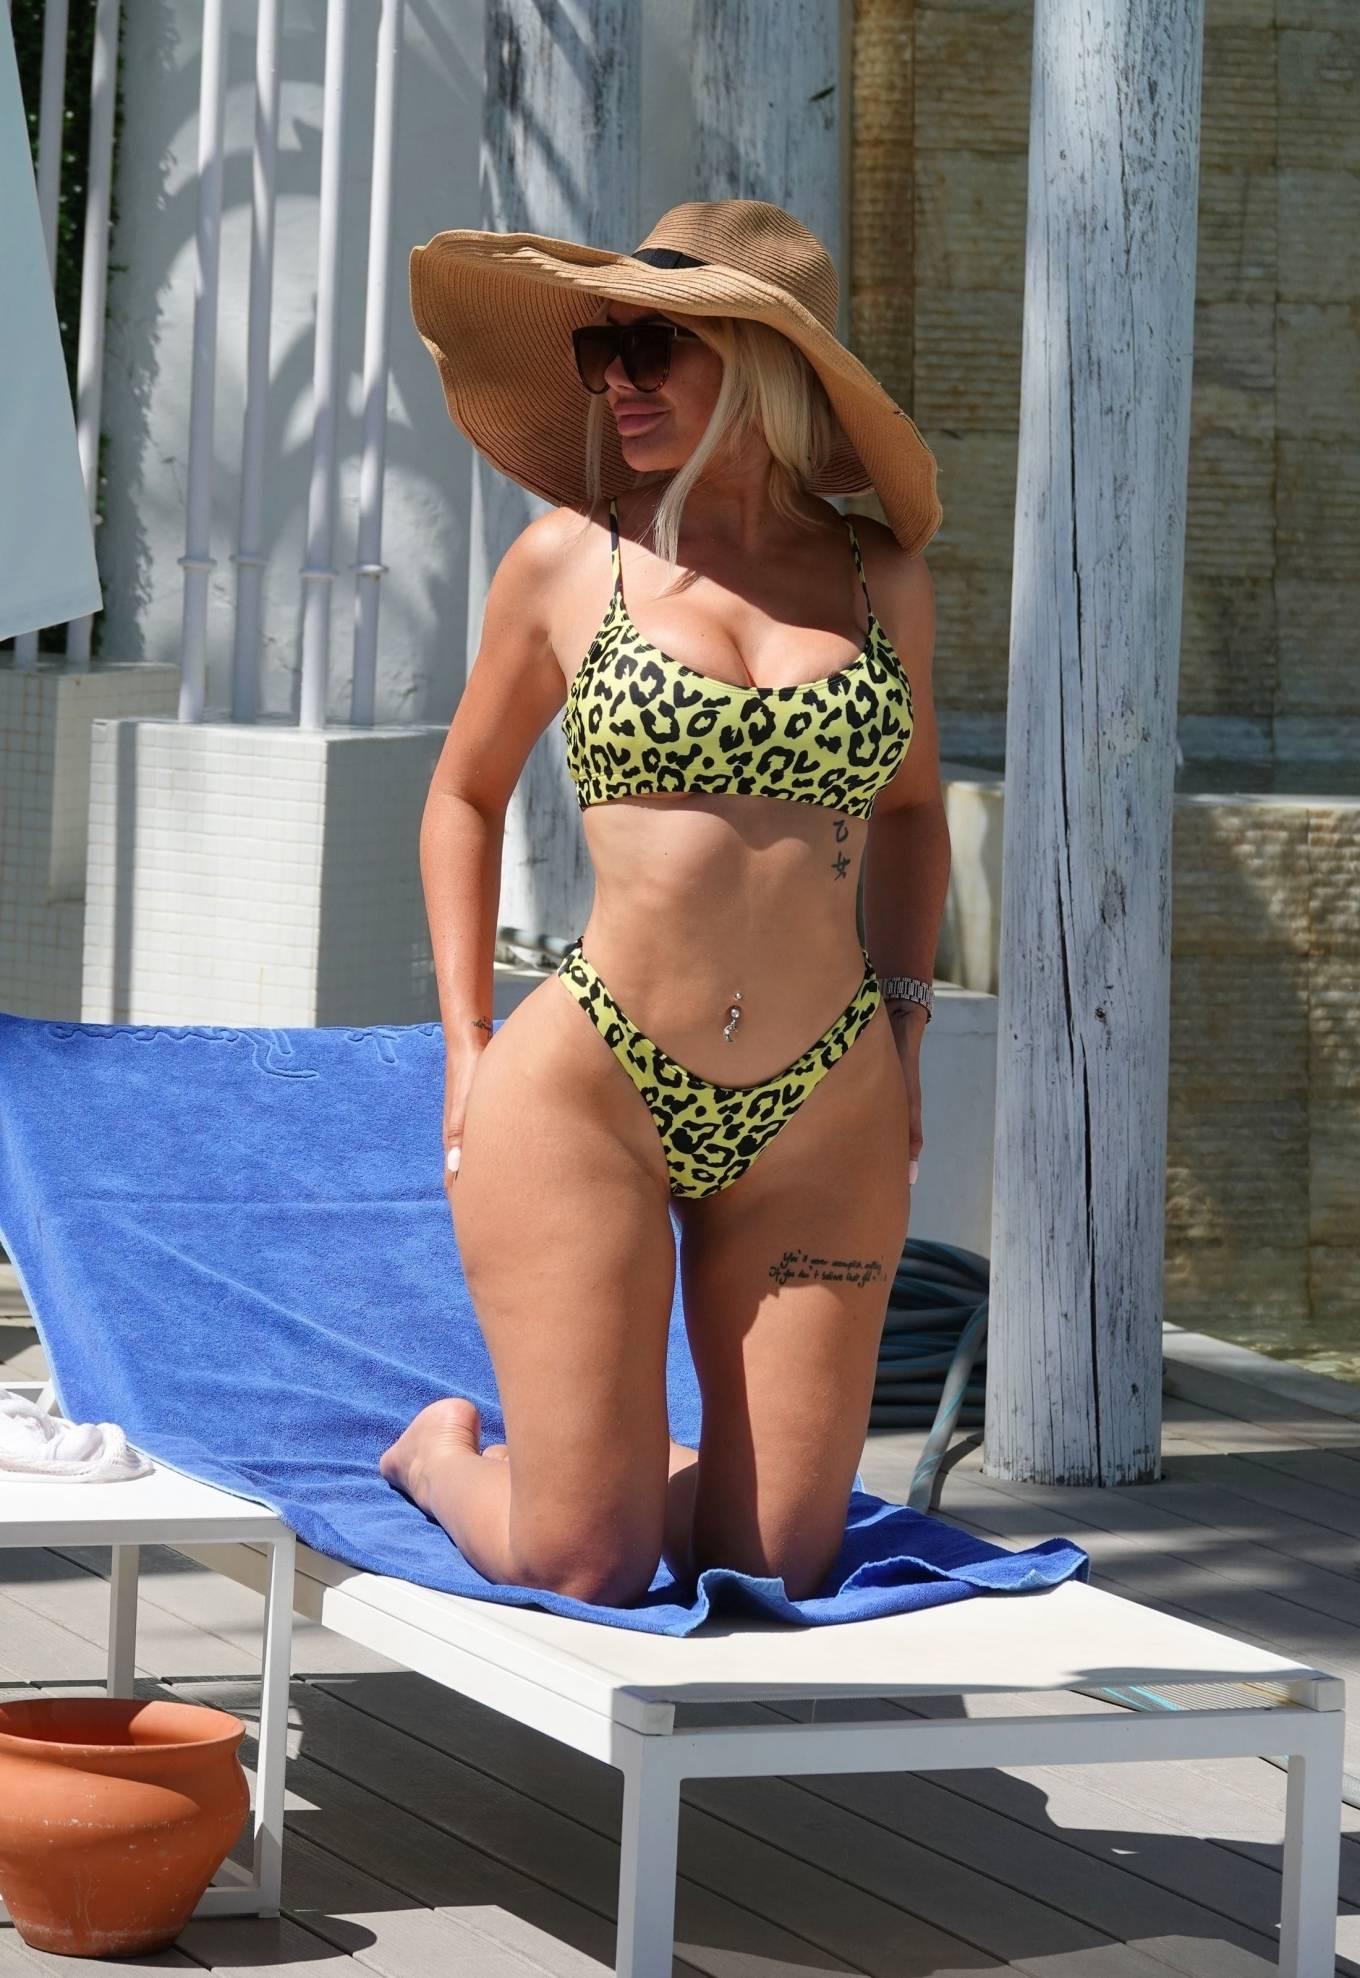 Chloe Ferry - In a bikini poolside on holiday in Marbella